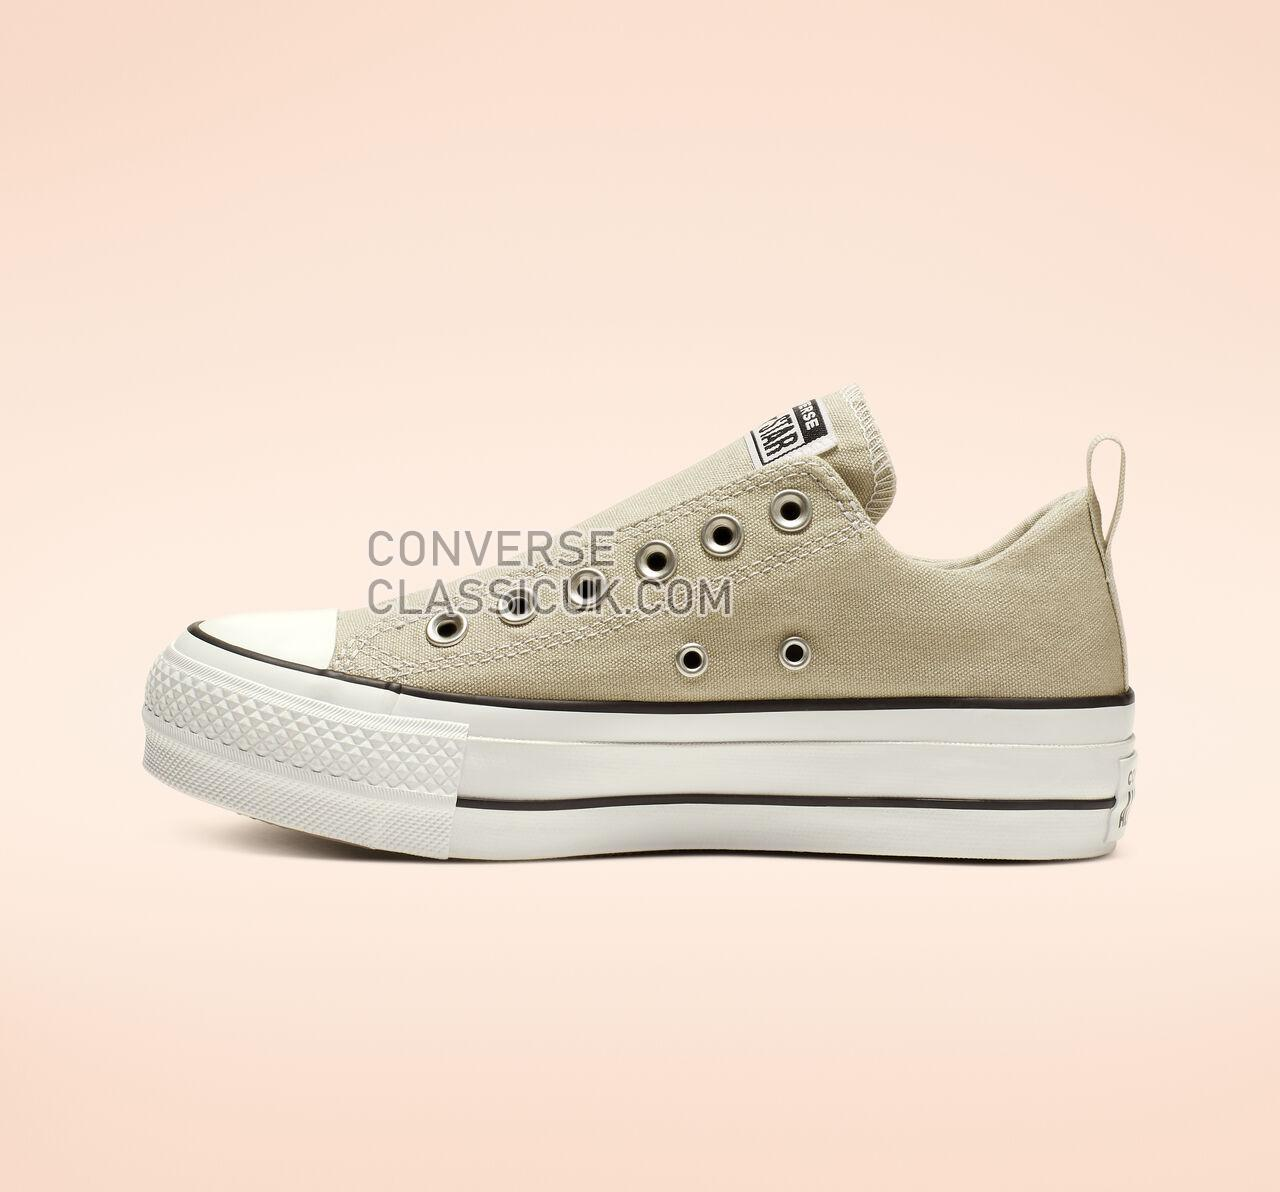 Converse Chuck Taylor All Star Cali Mood Platform Low Top Womens 564340C Light Surplus/White/Black Shoes